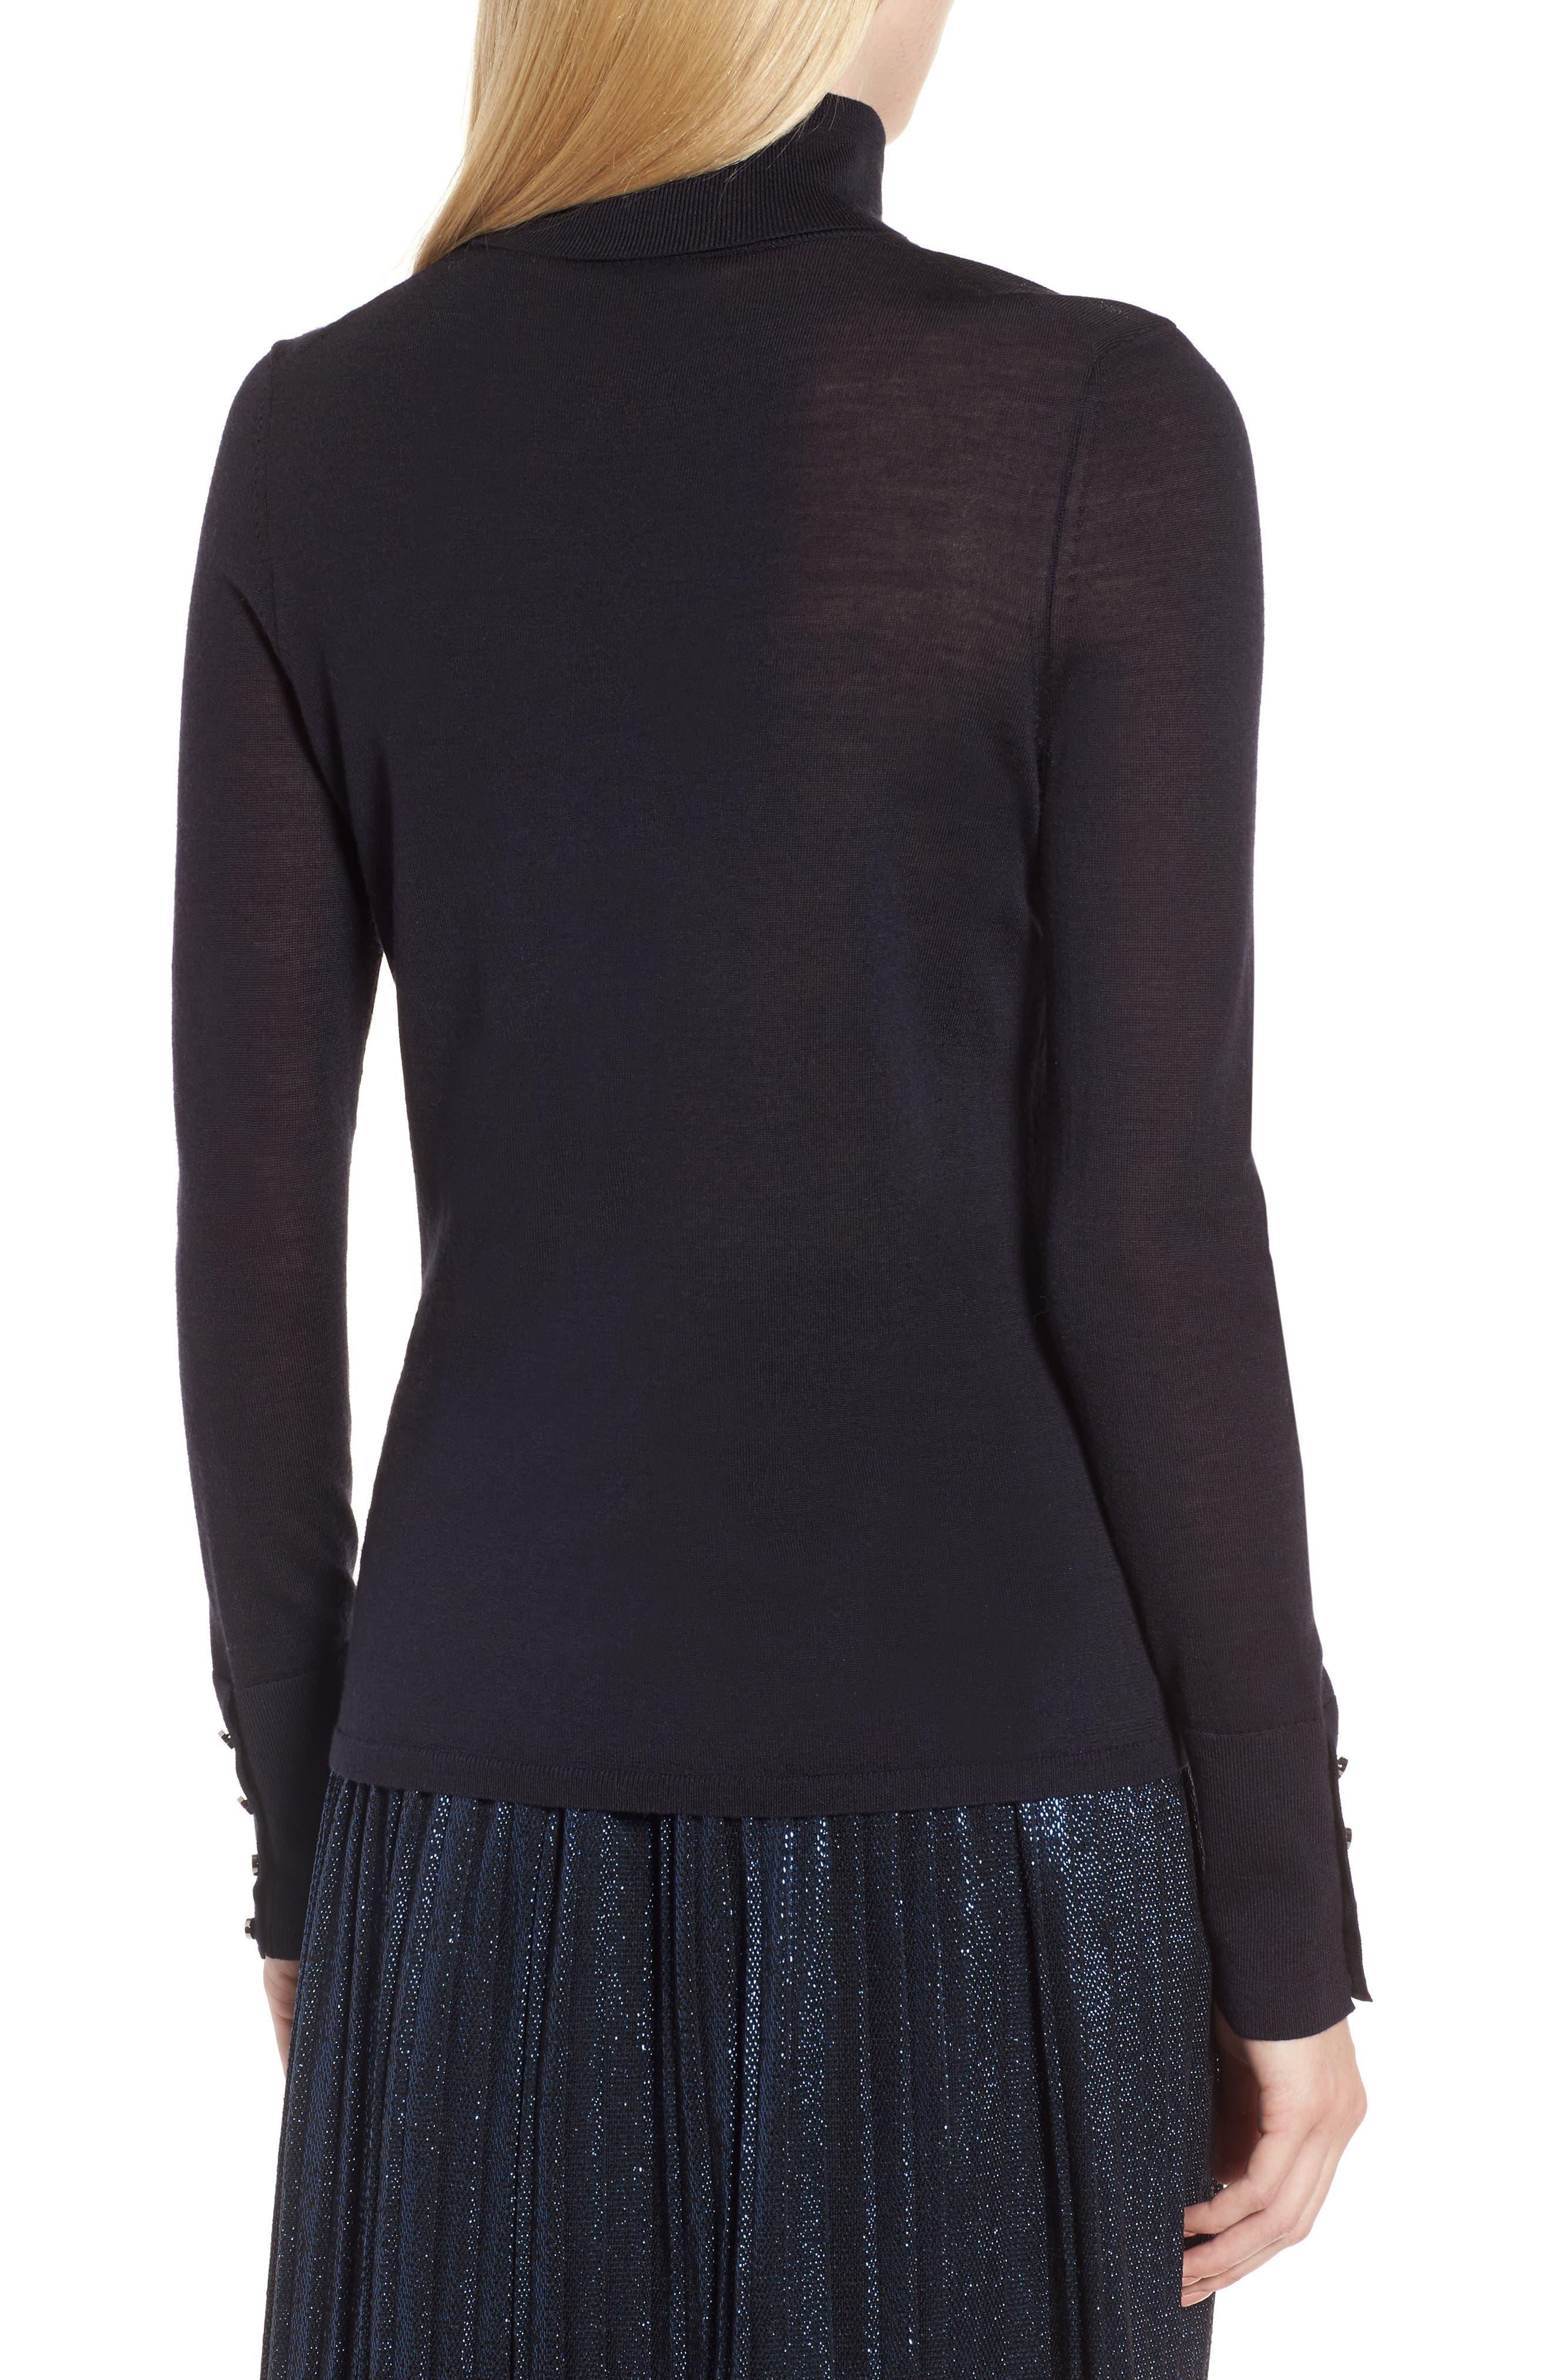 Farrella Wool Turtleneck Sweater,                             Alternate thumbnail 2, color,                             480